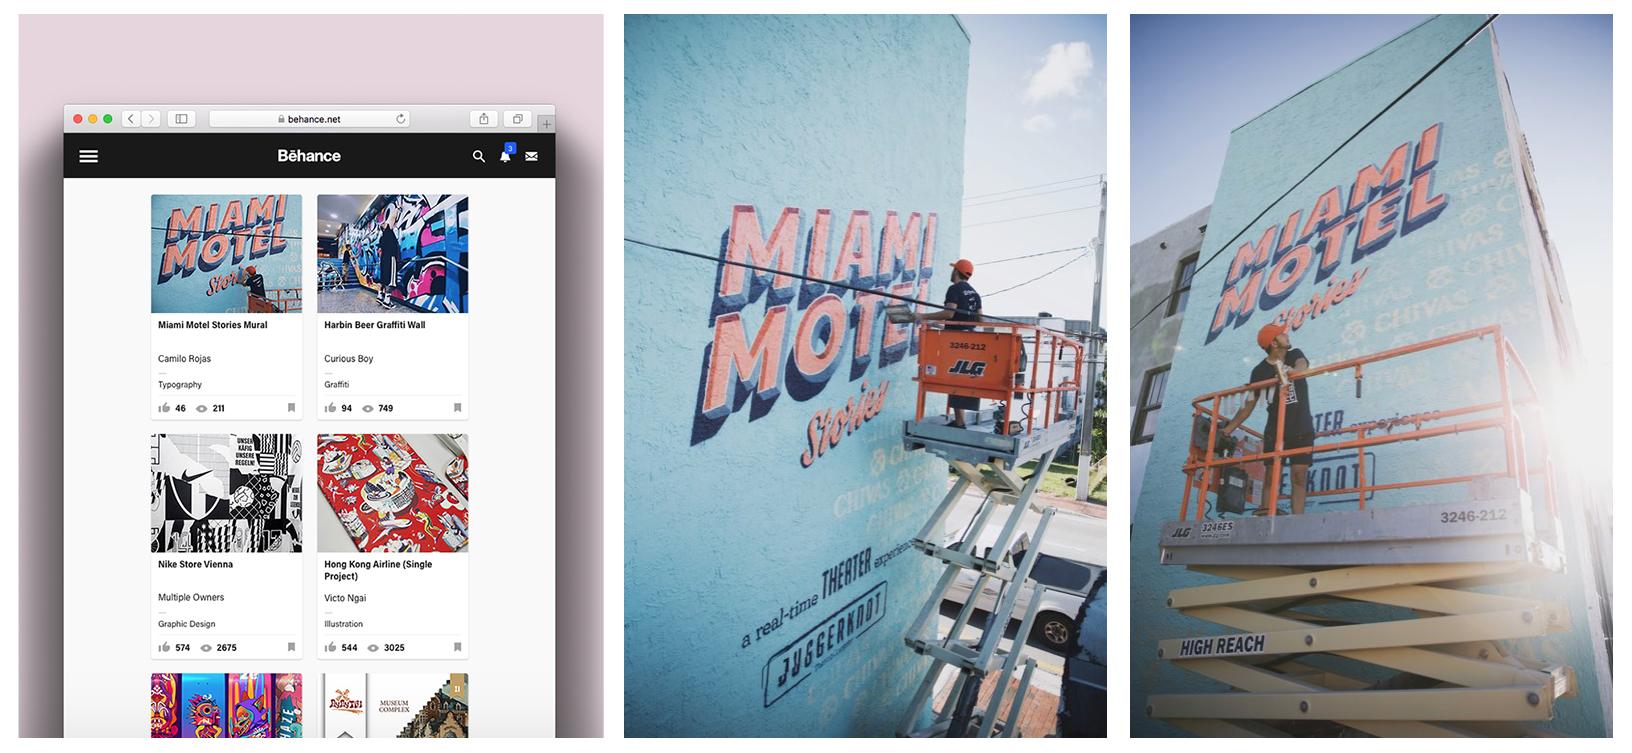 camilo-rojas-mural-miami.jpg